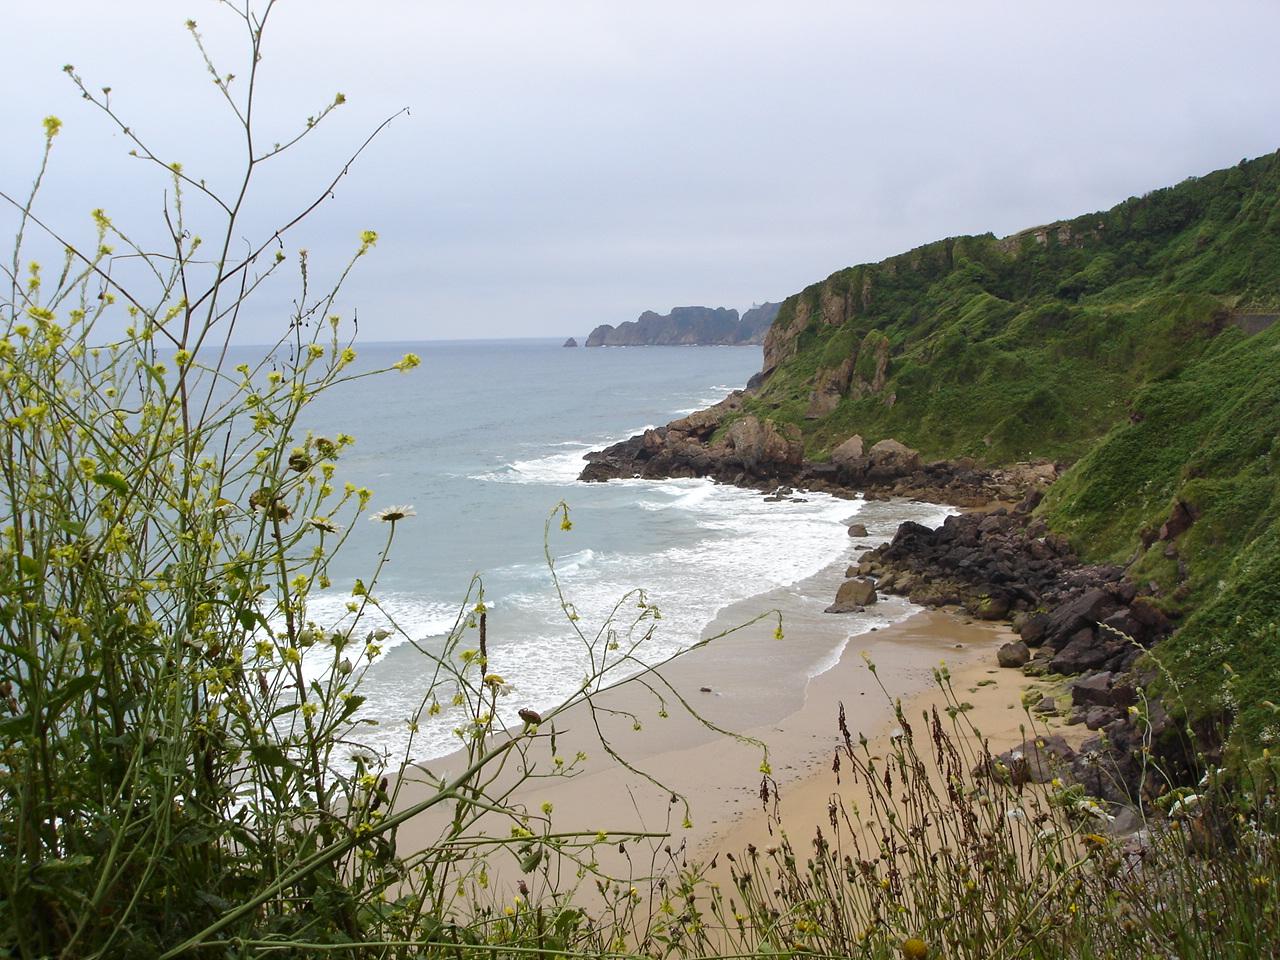 Playa Tranqueru